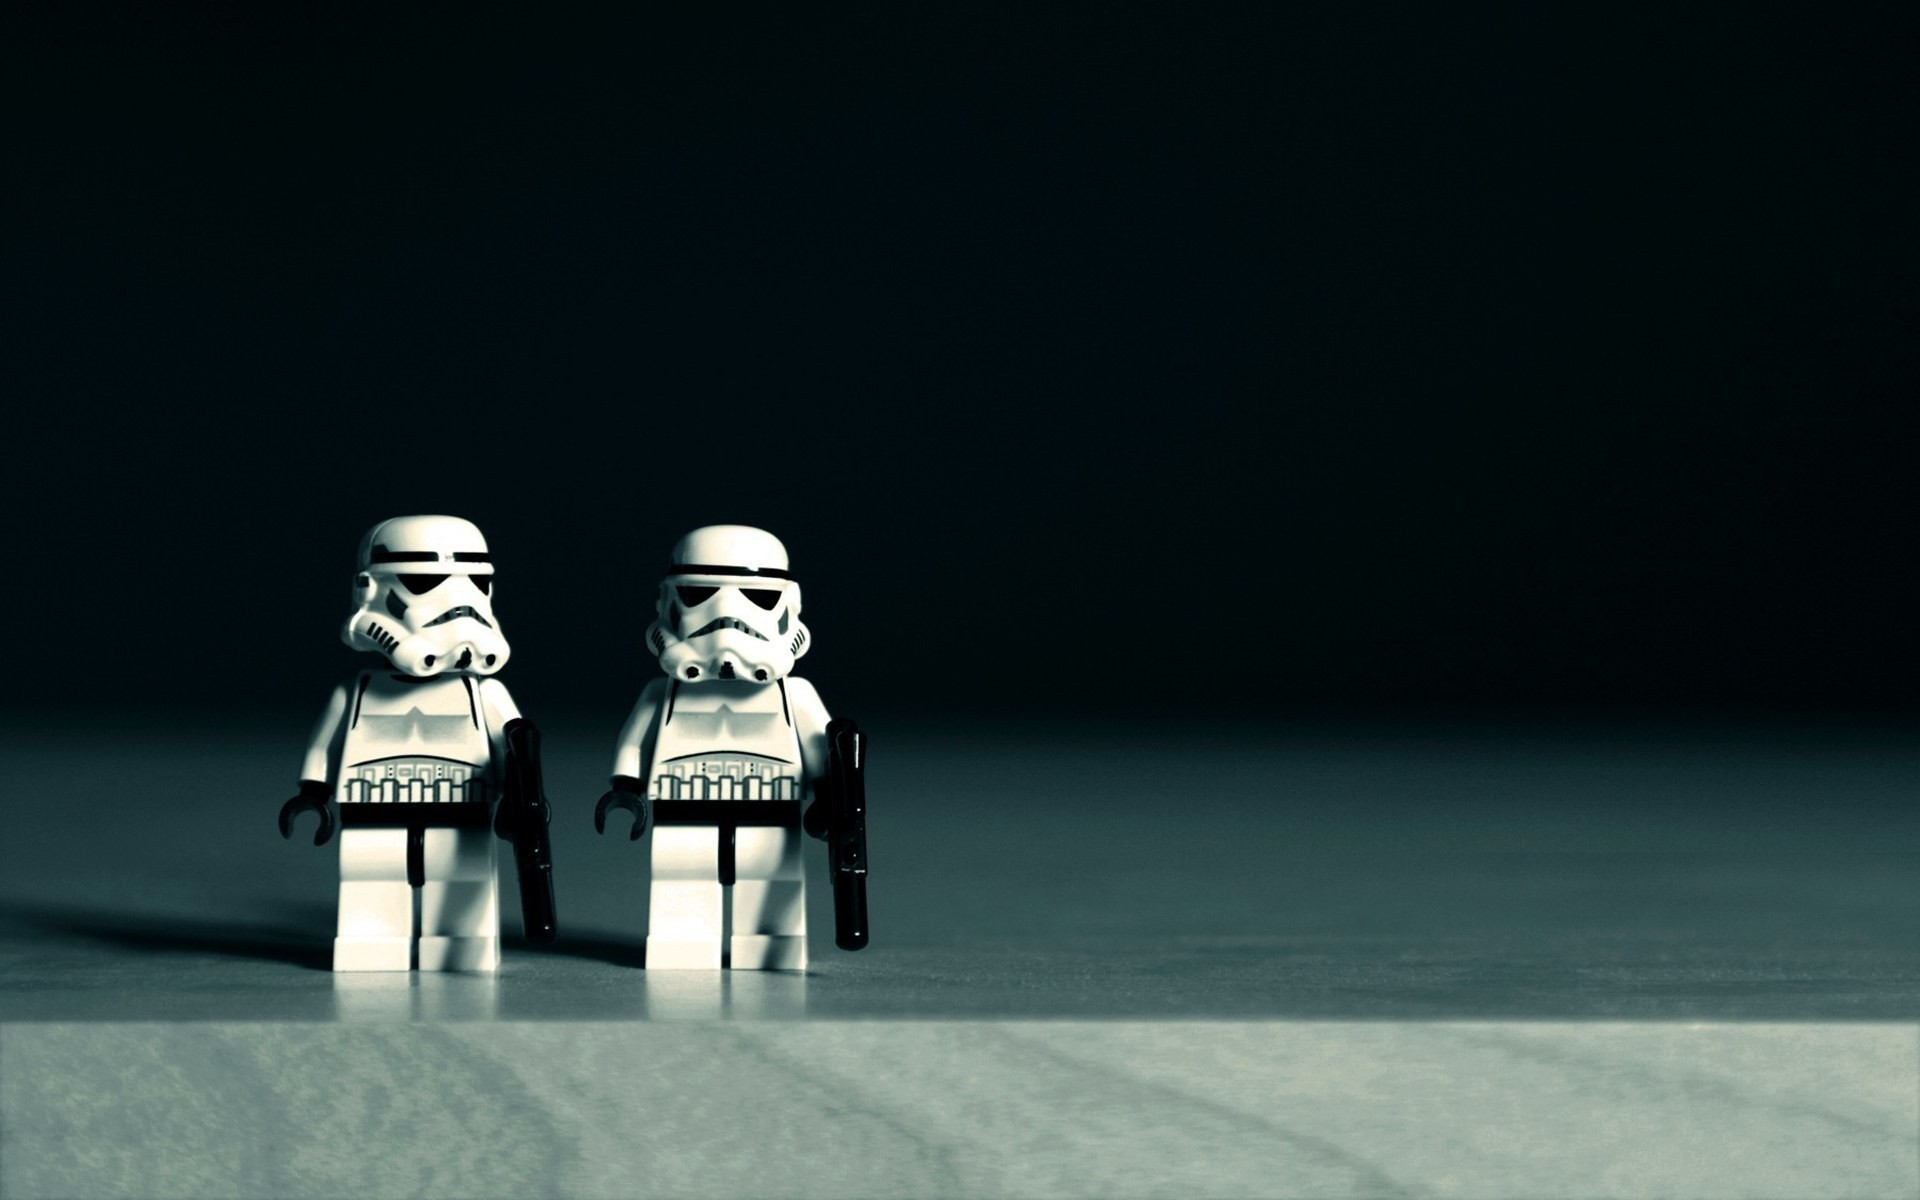 Image – Star-wars-stormtroopers-toys-macro-lego-hd-wallpaper.jpg   Lego  Star Wars Wiki   FANDOM powered by Wikia